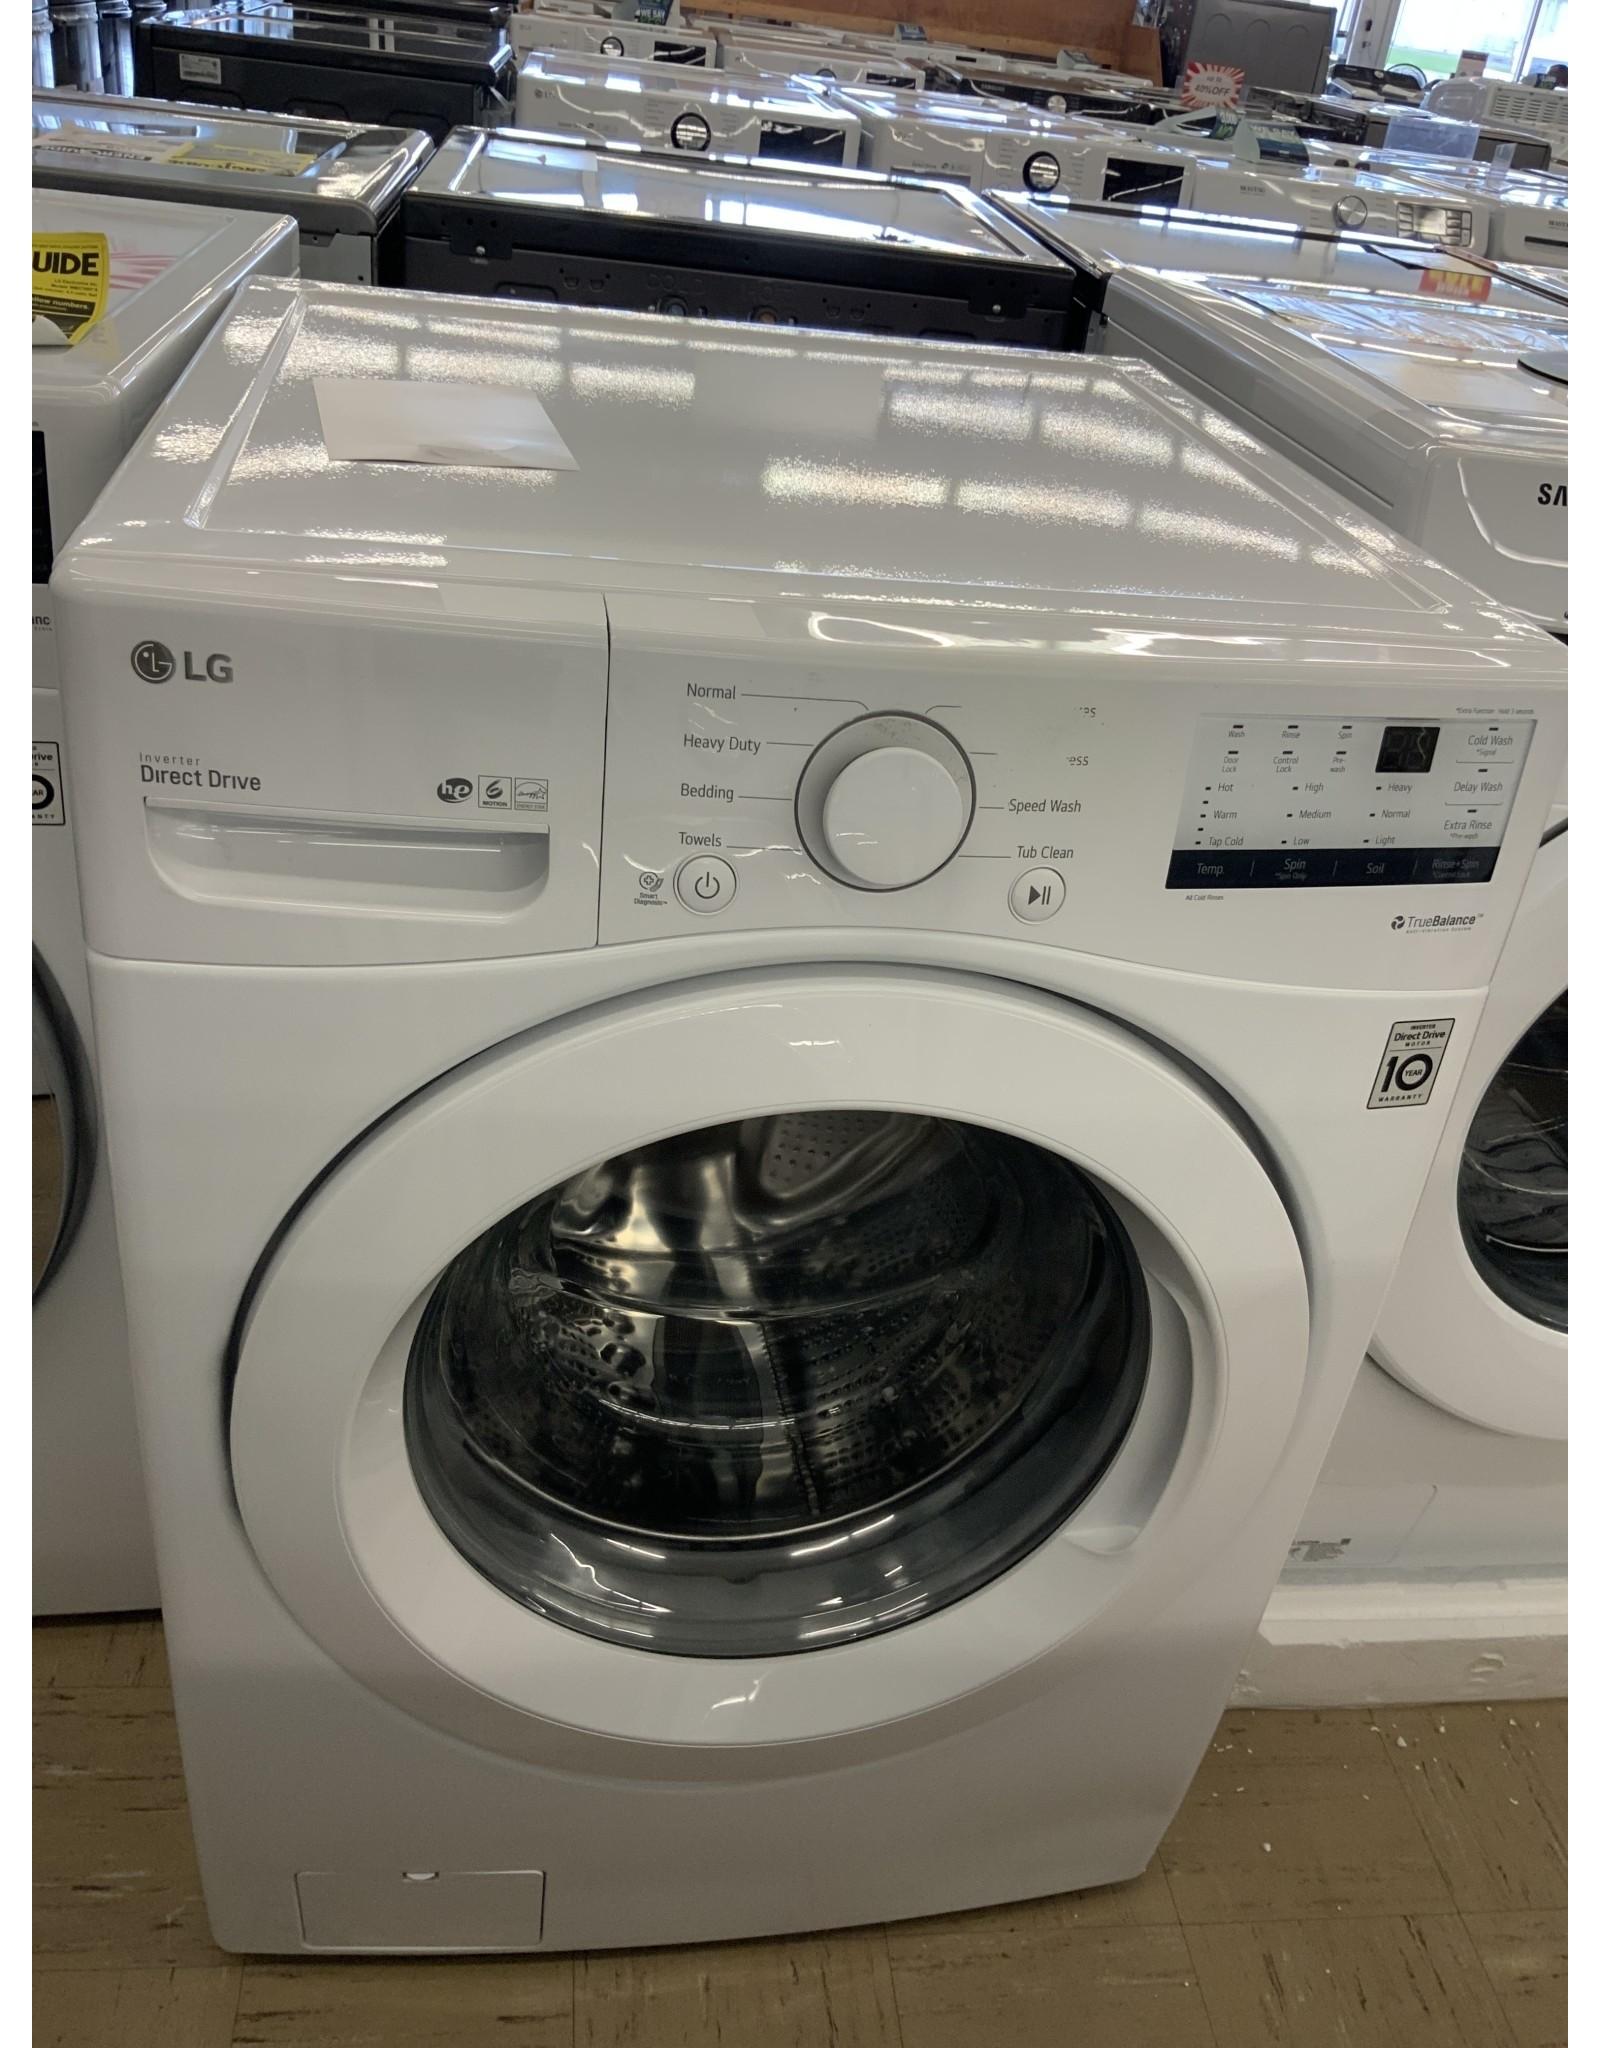 LG Electronics WM3400CW 4.5 cu. ft. Ultra Large Capacity White Front Load Washing Machine with Coldwash Technology